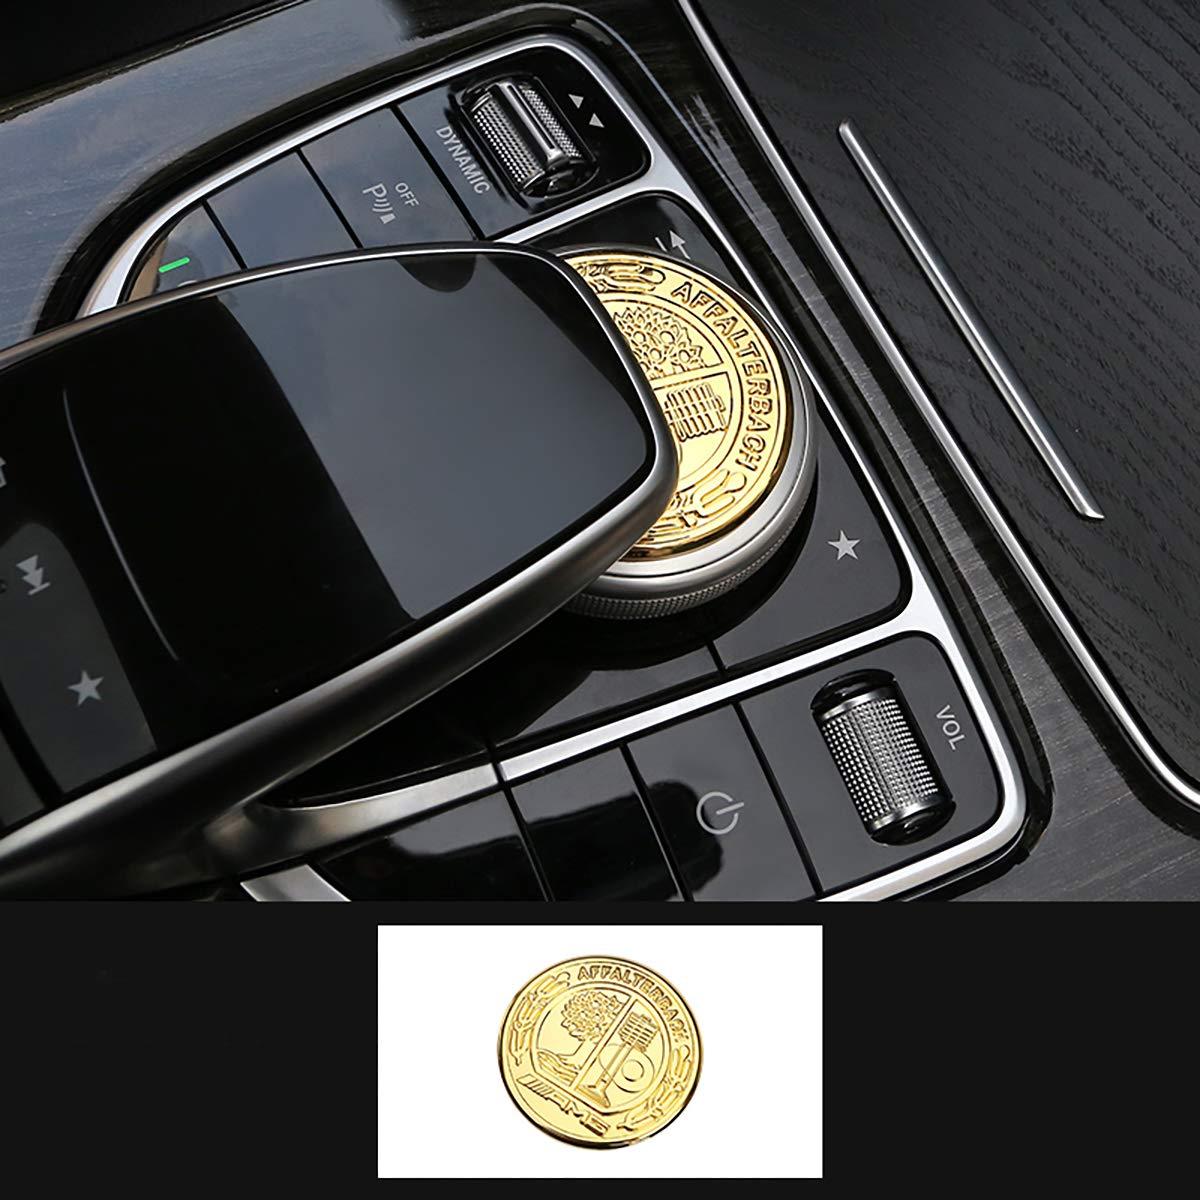 TopDall Mercedes-Benz AMG Interior Media Multimedia Control Decal Sticker Badge Luxury Decoration Affalterbach Tree Logo for C Class//GLC Class//E Class